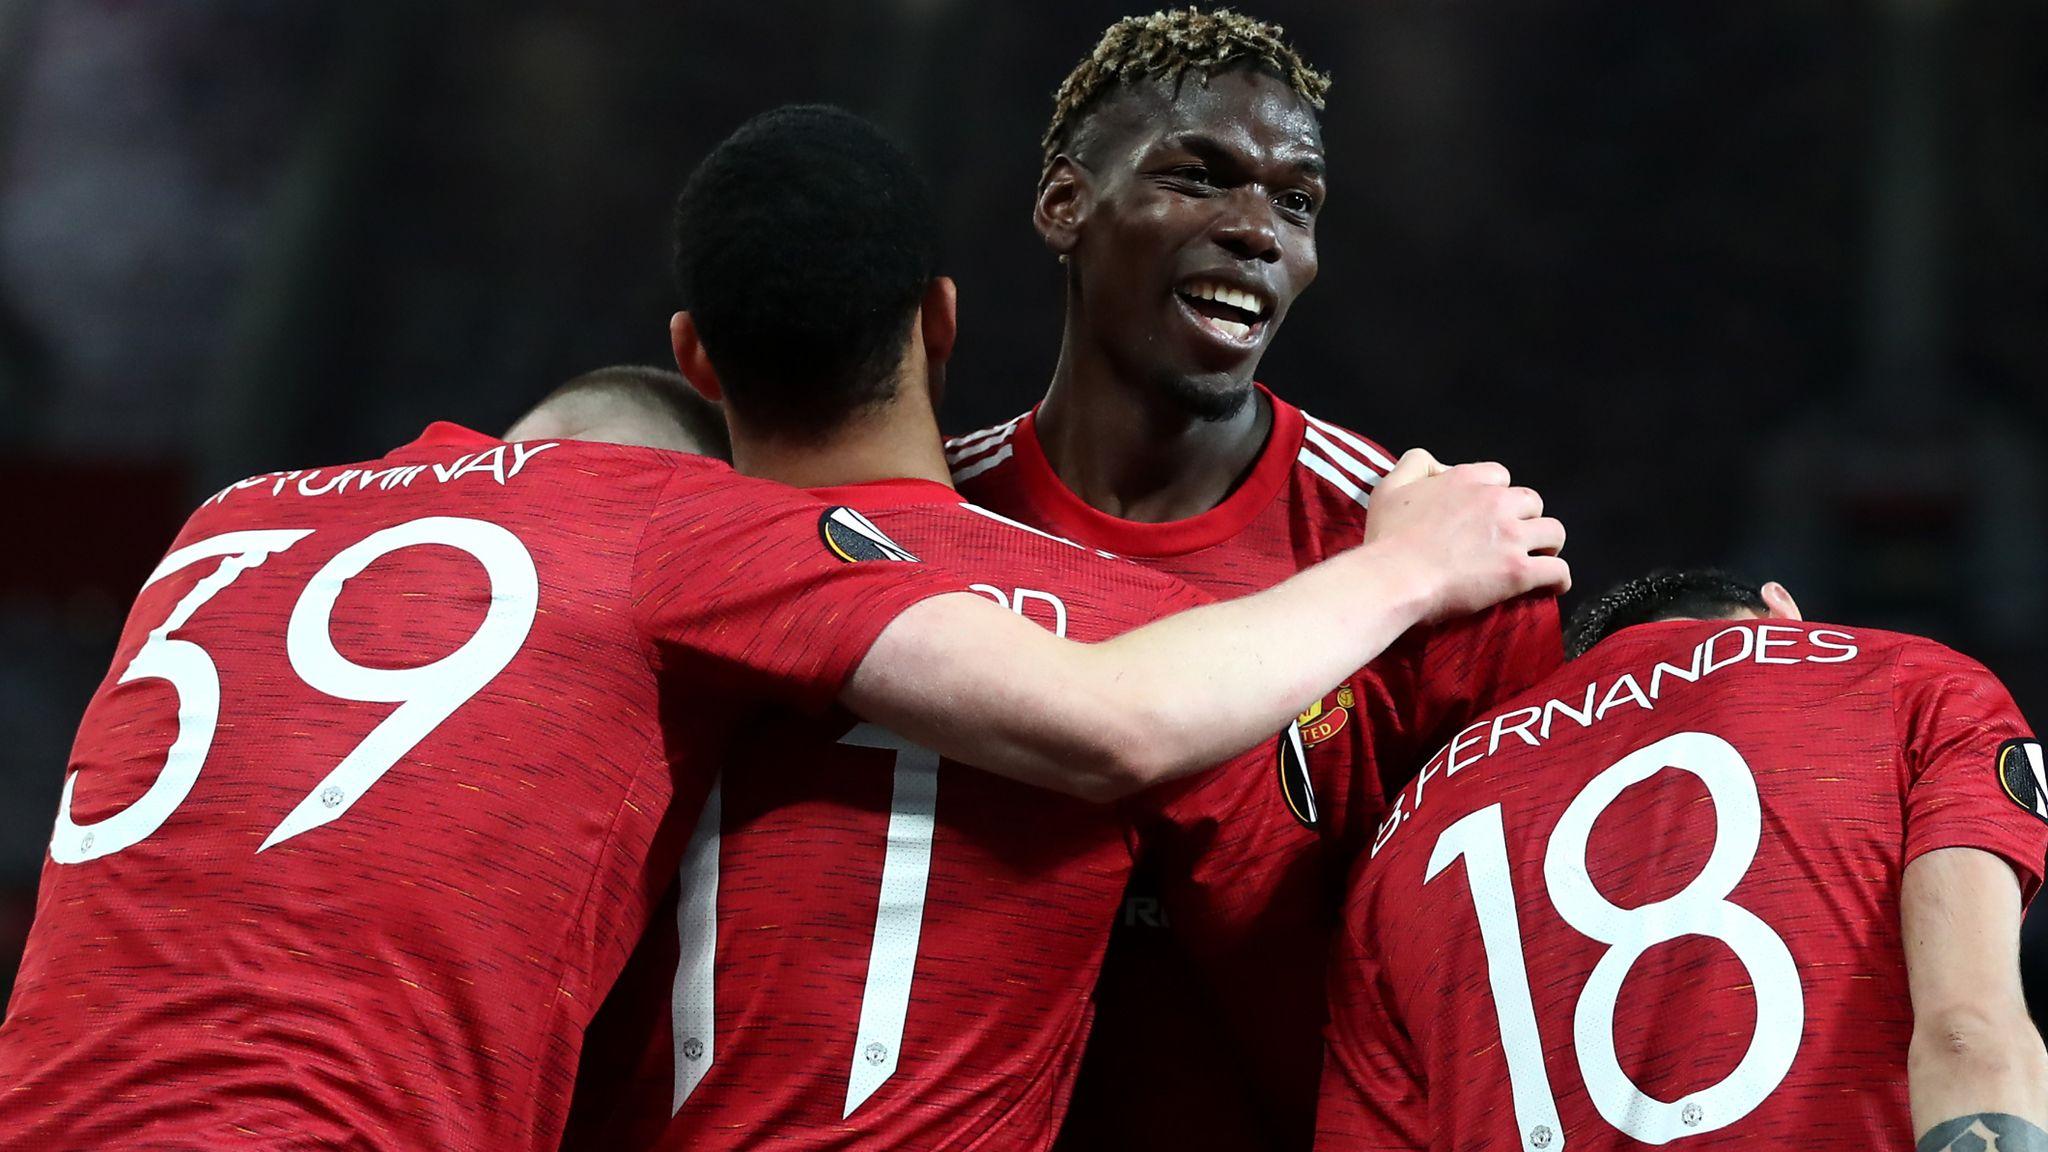 Manchester United 6-2 Roma: Stunning second-half fightback seizes control  of Europa League semi-final | Football News | Sky Sports